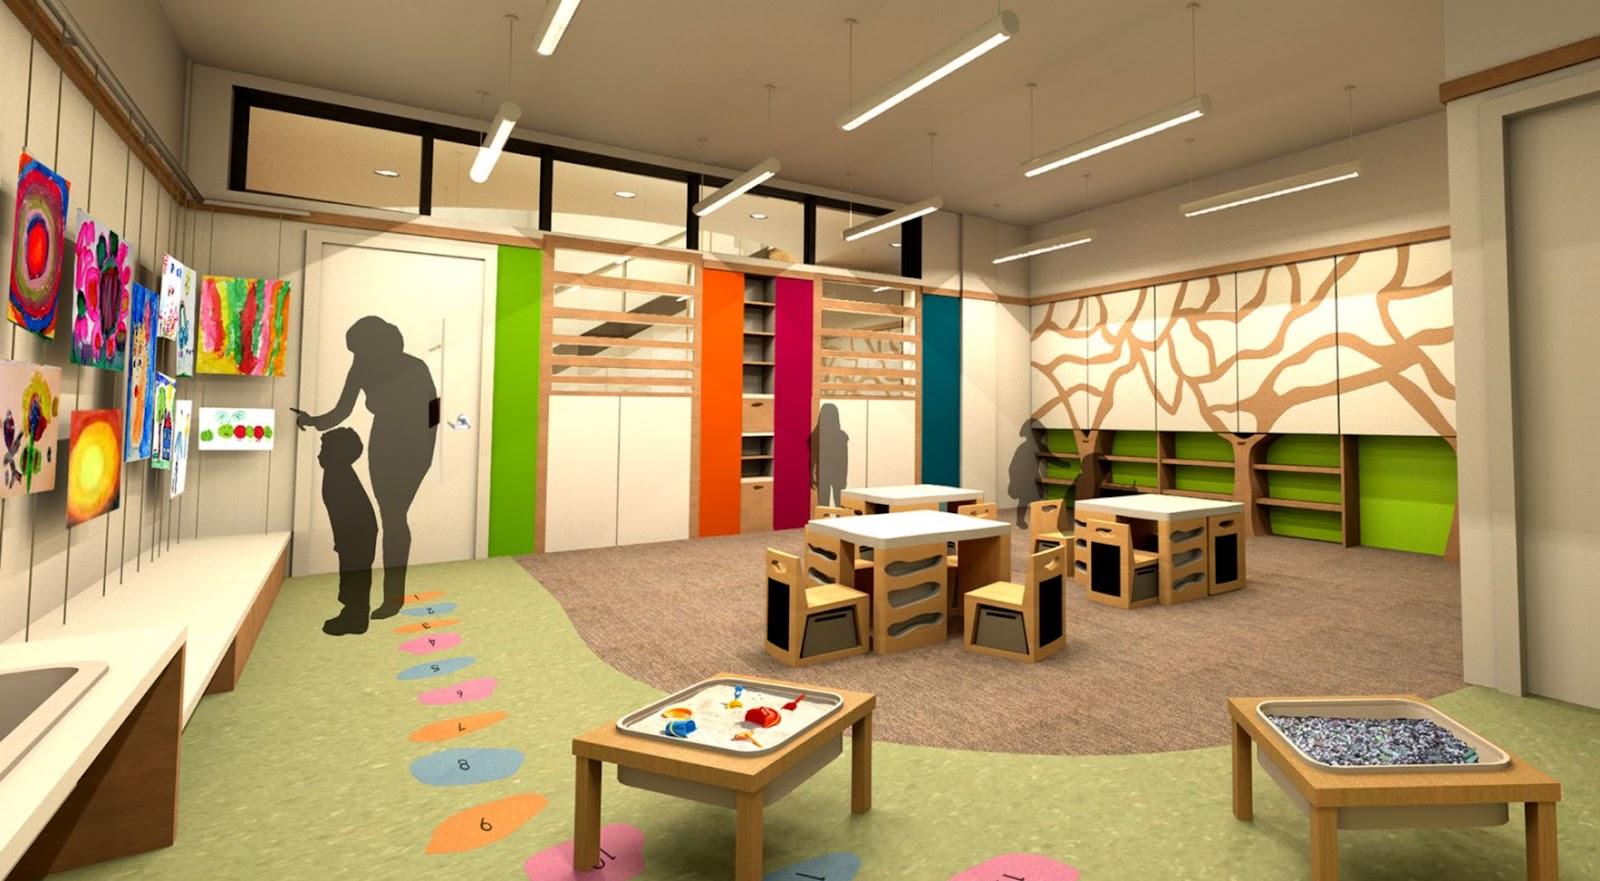 Interior design schools houston best home decorating ideas - Interior design schools in houston ...